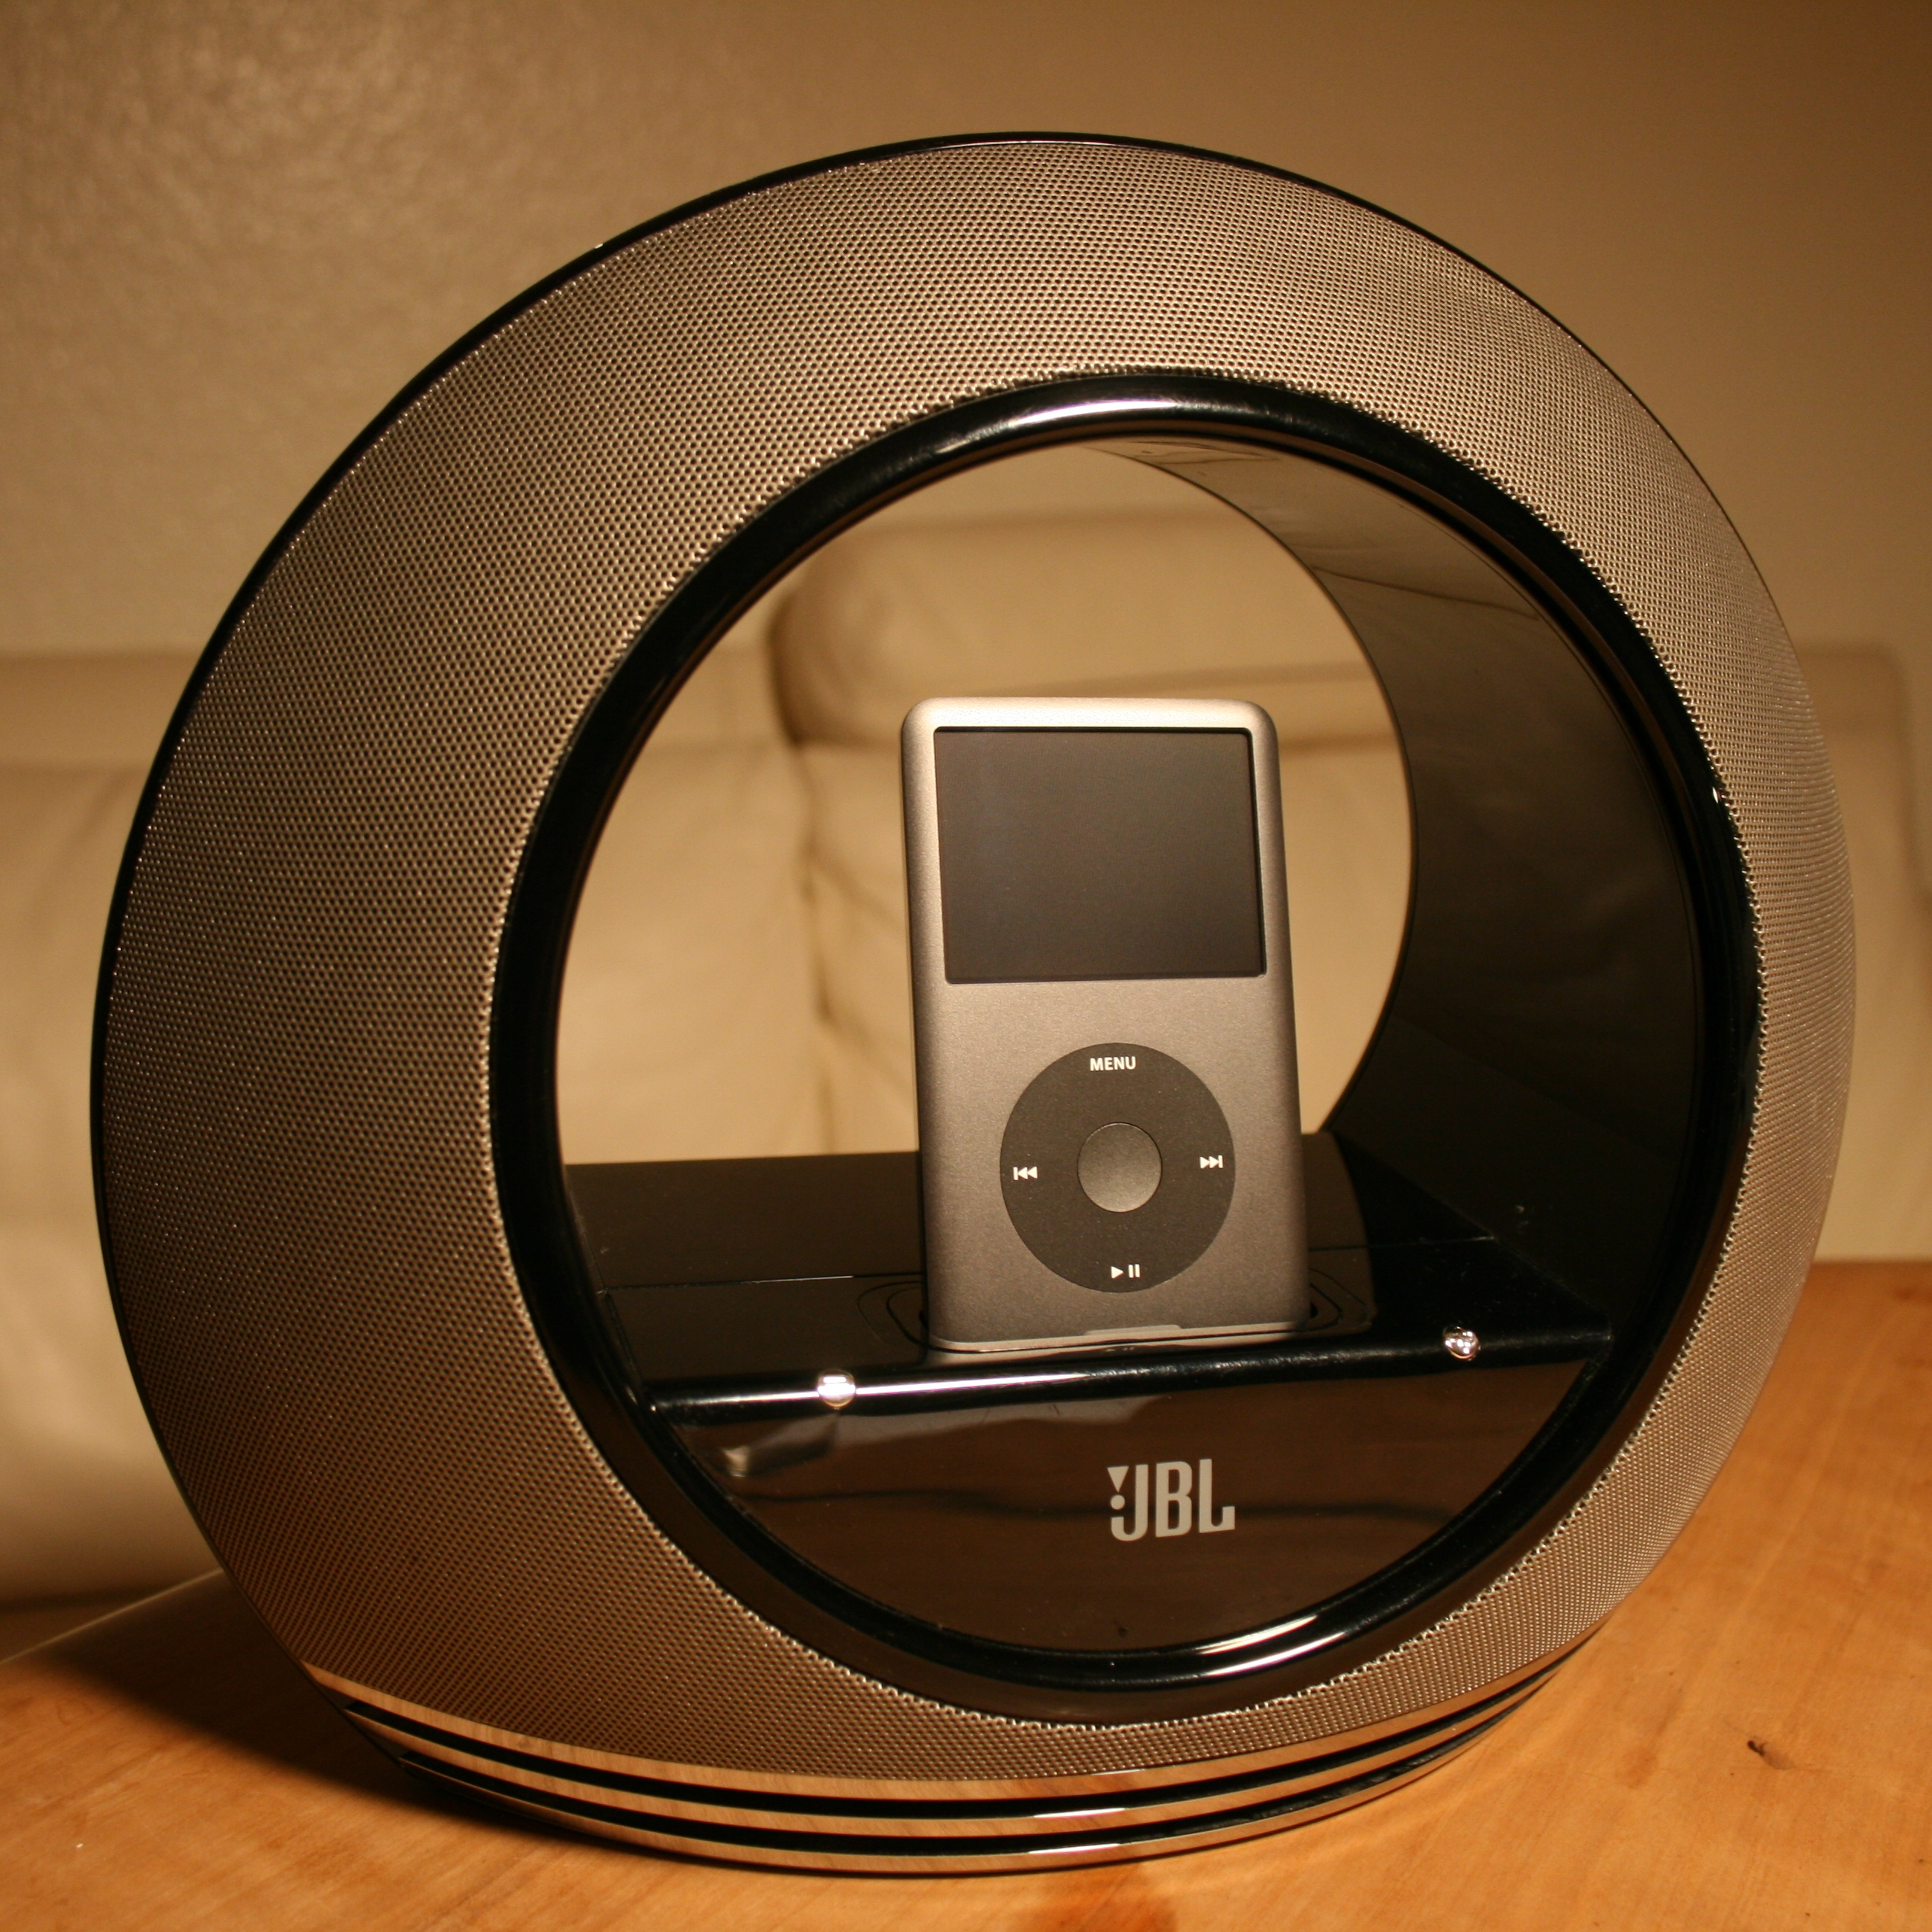 file jbl wikimedia commons. Black Bedroom Furniture Sets. Home Design Ideas